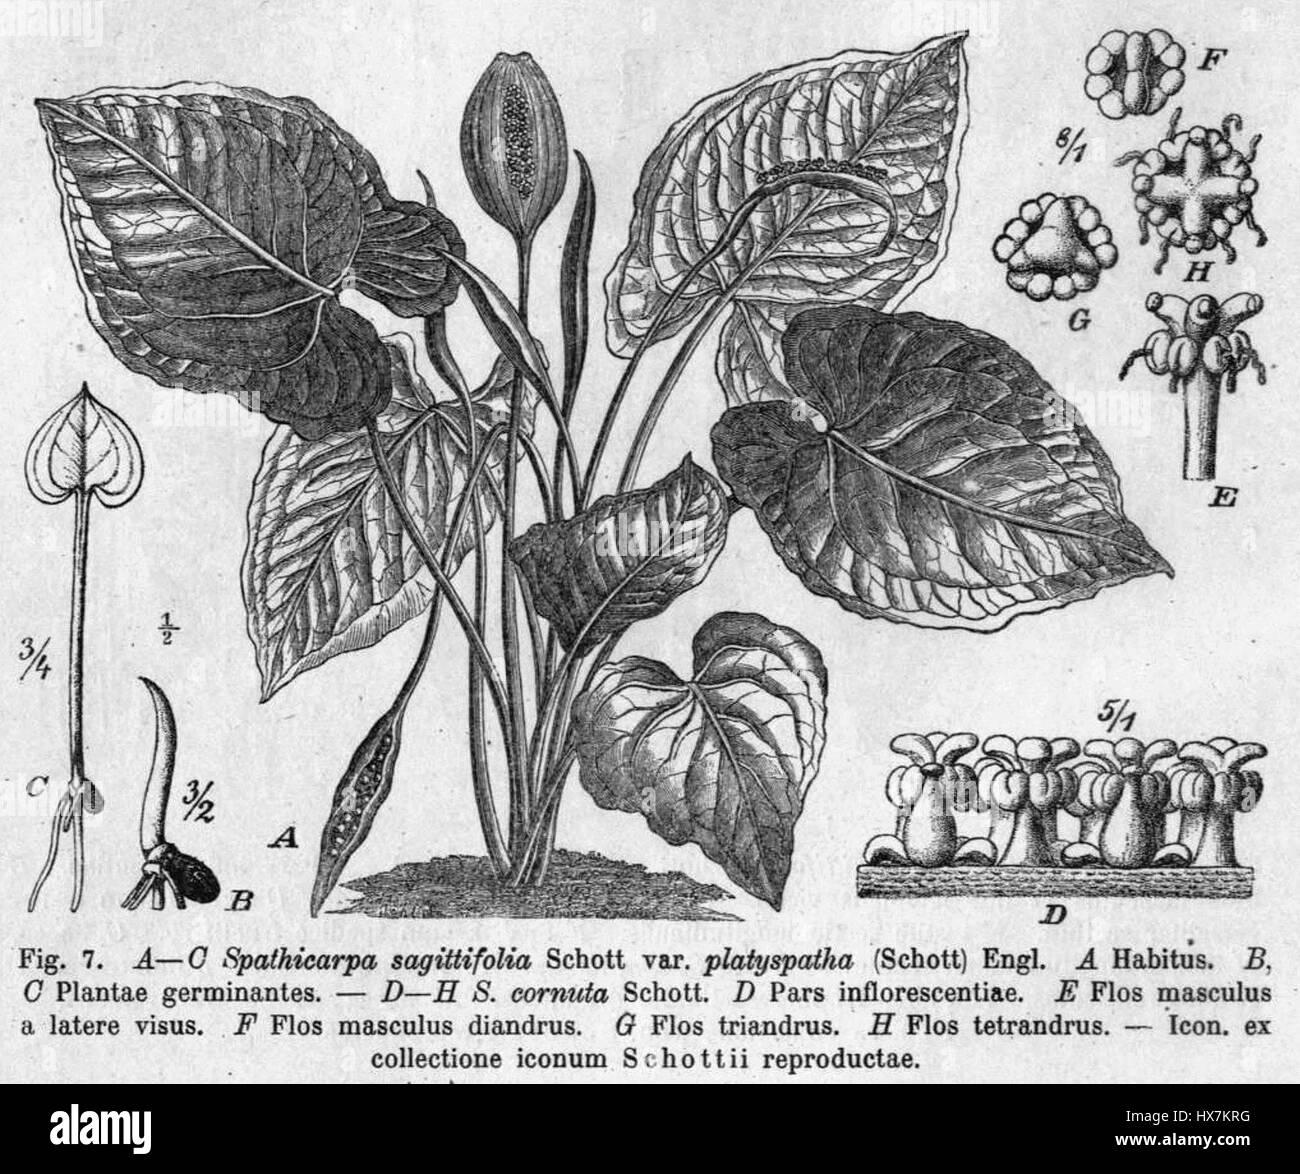 Spathicarpa hastifolia plant Pflanzenreich - Stock Image